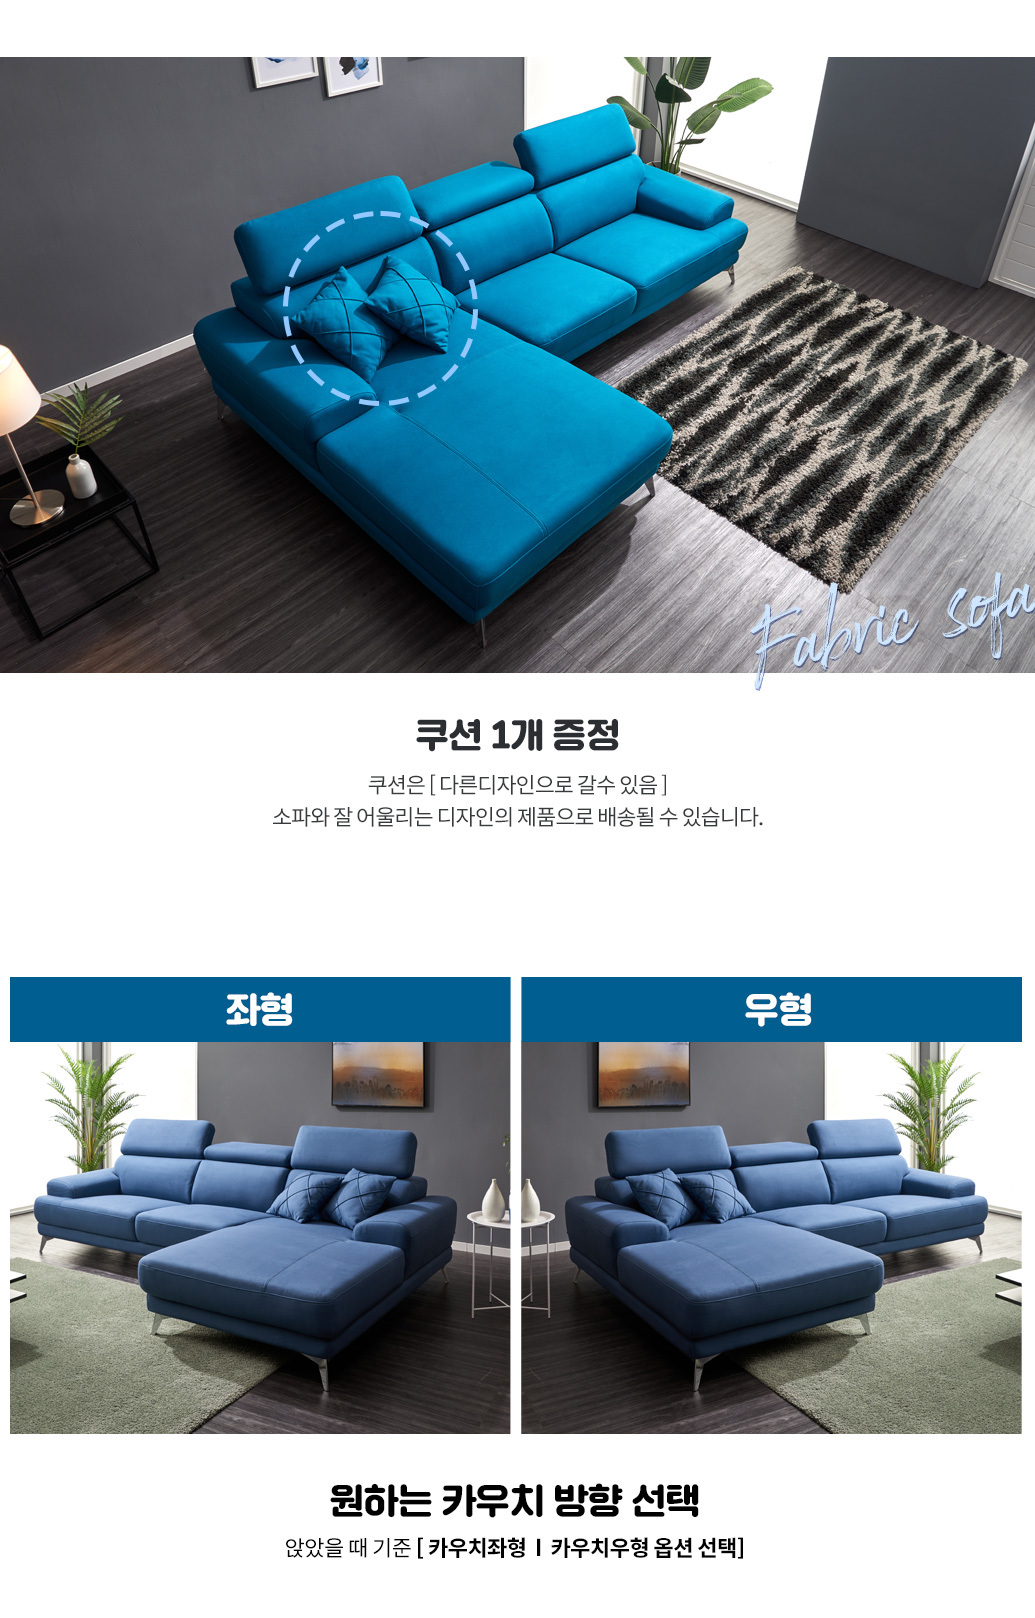 reve_couch_06.jpg